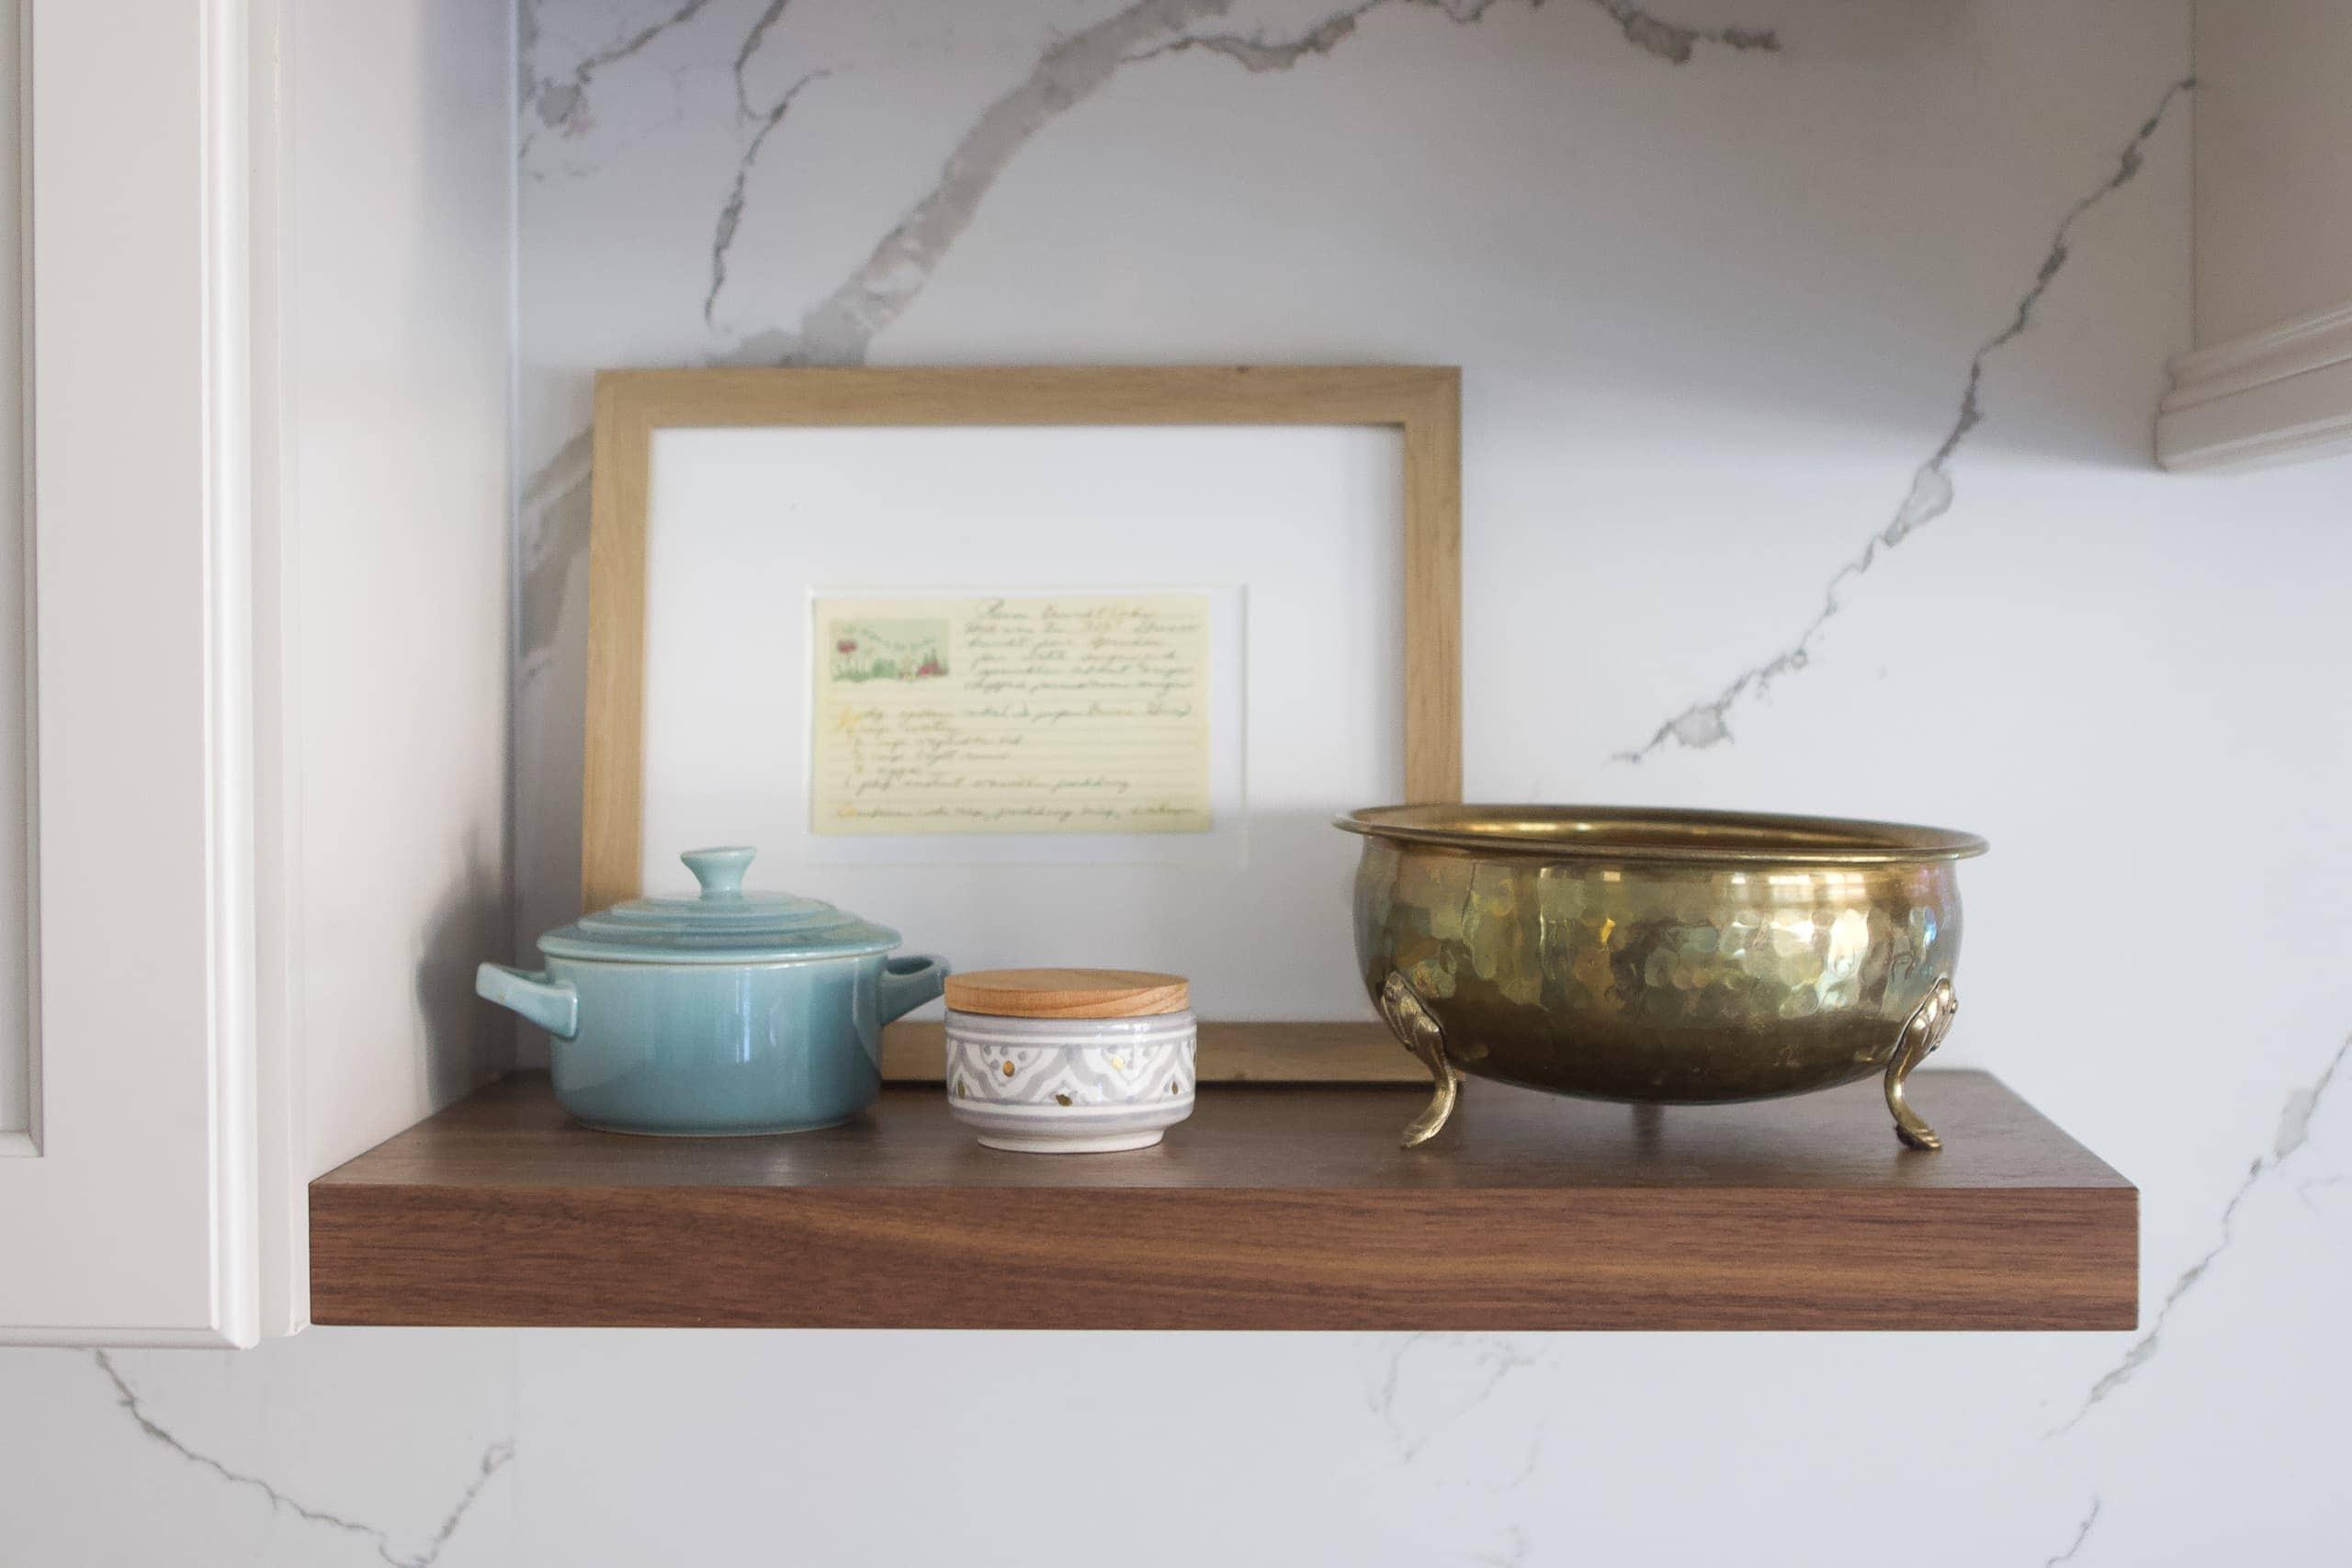 Adding framed recipe cards to the shelves